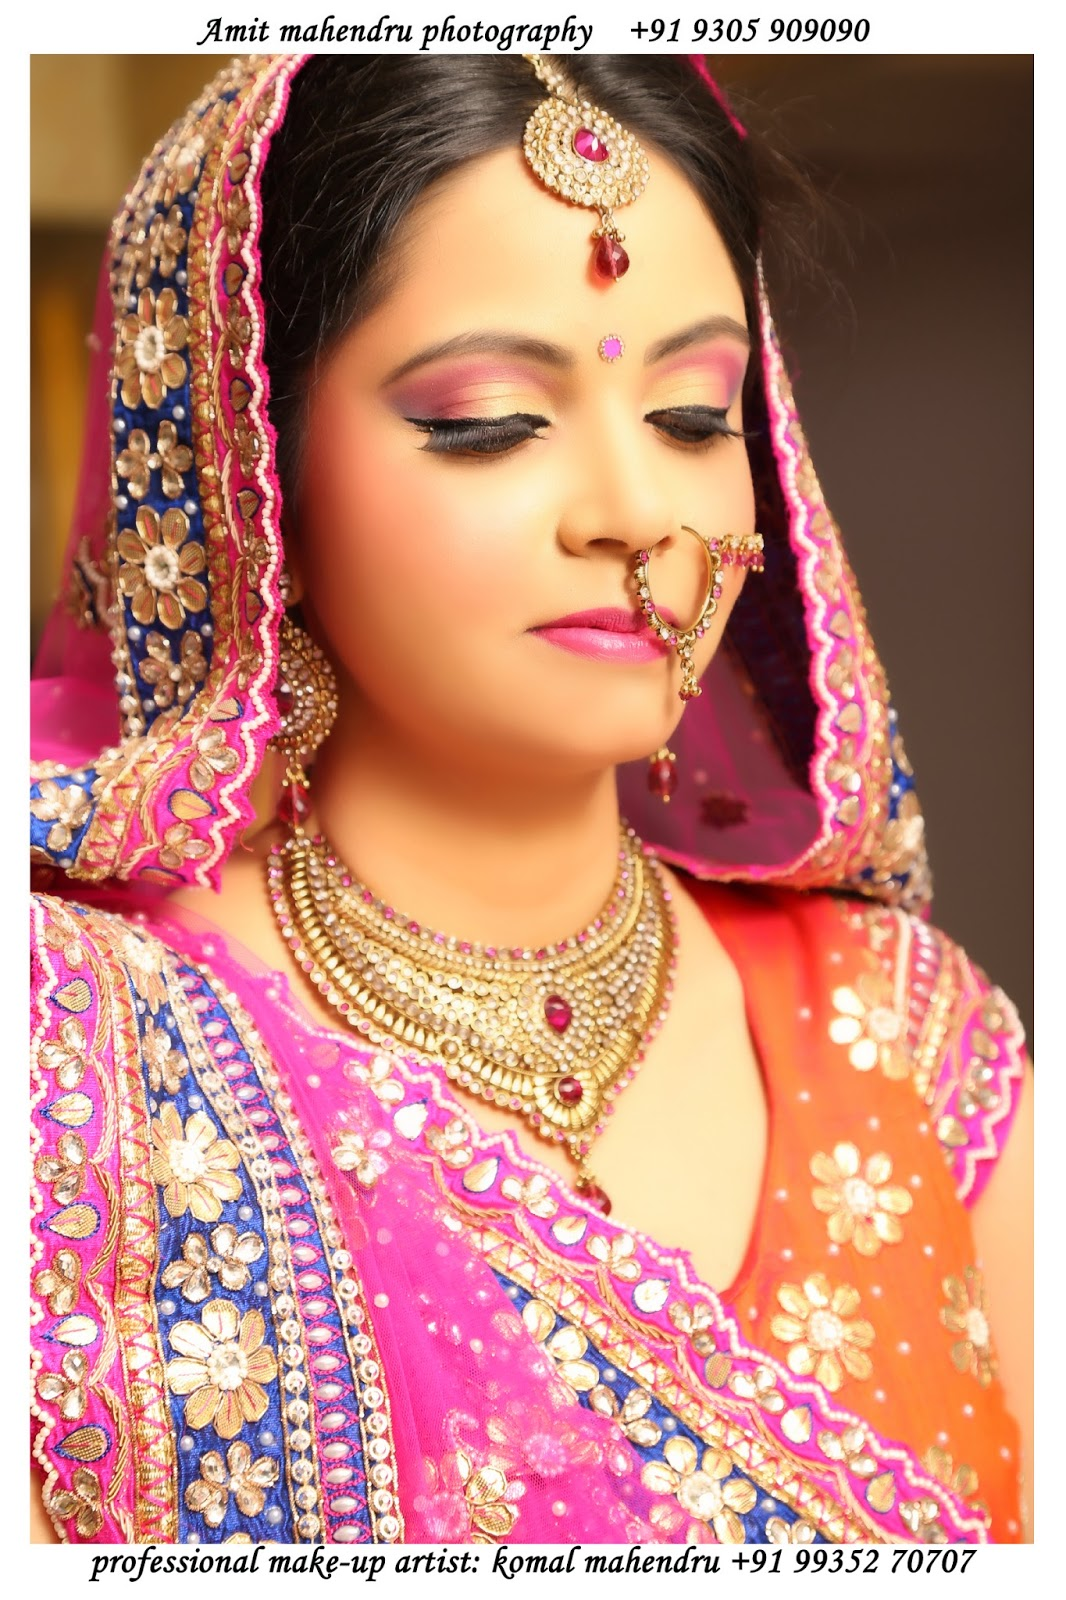 Komal mahendru s professional makeup lucknow india bridal makeup - Https Www Facebook Com Komal Mahendru